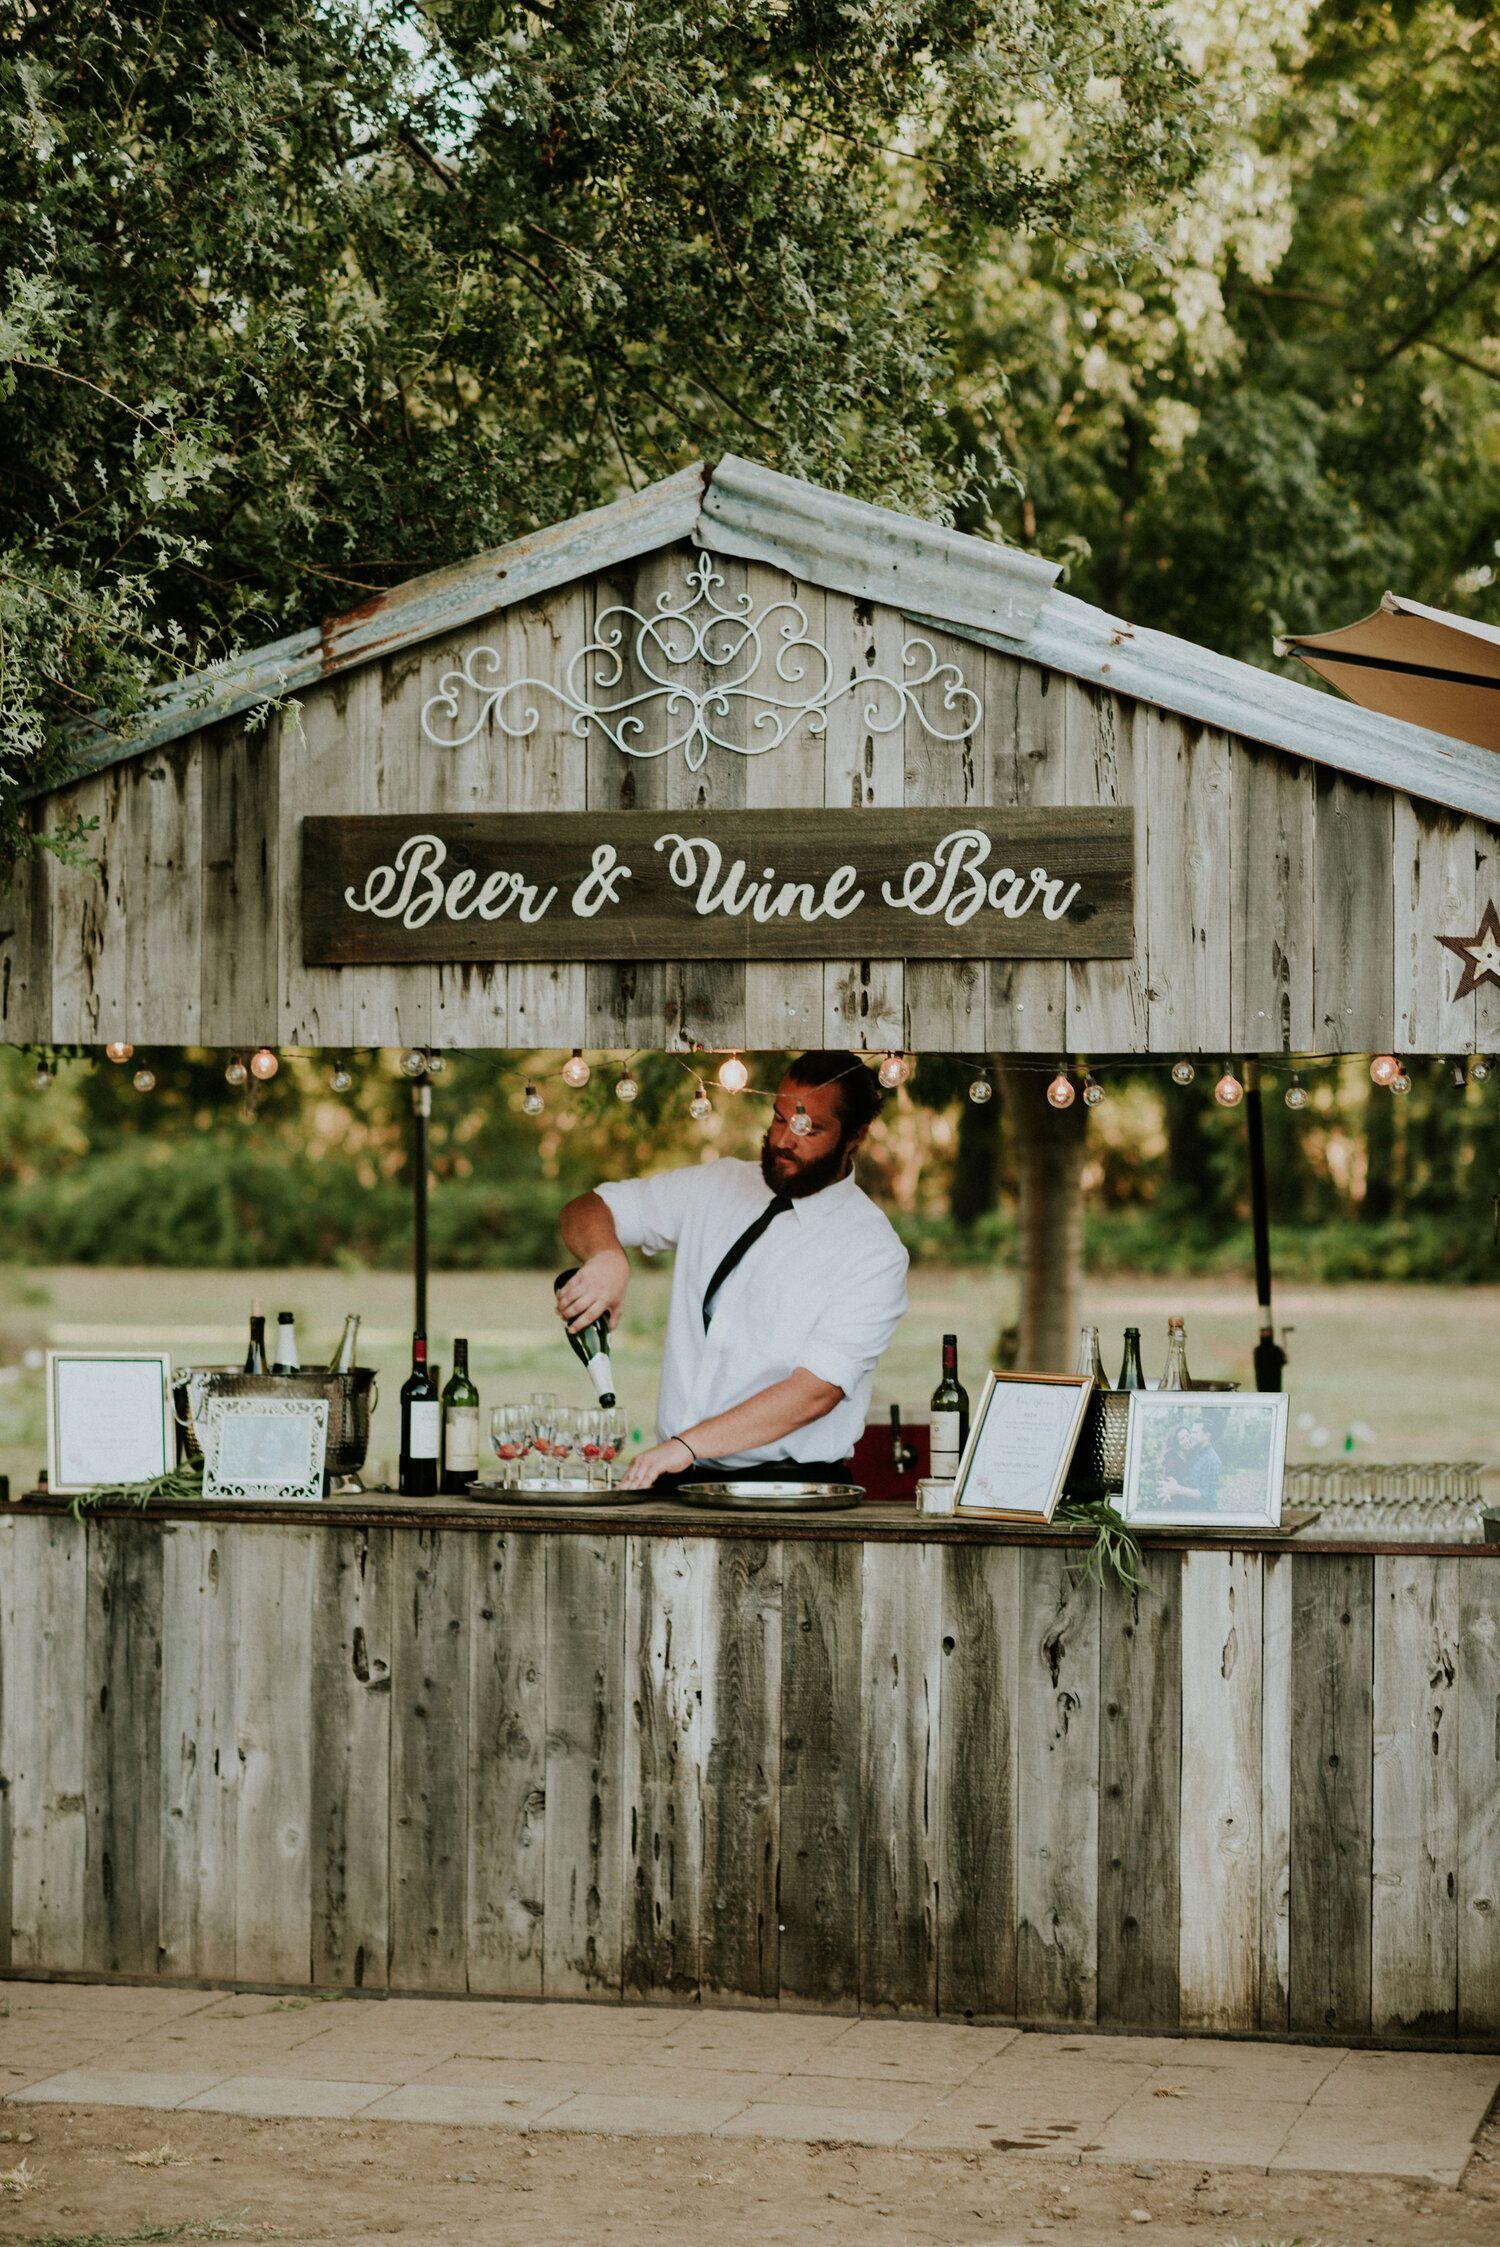 Rustic Outdoor Wedding Bar Ideas Outdoor Wedding Bar Rustic Outdoor Wedding Rustic Wedding Bar